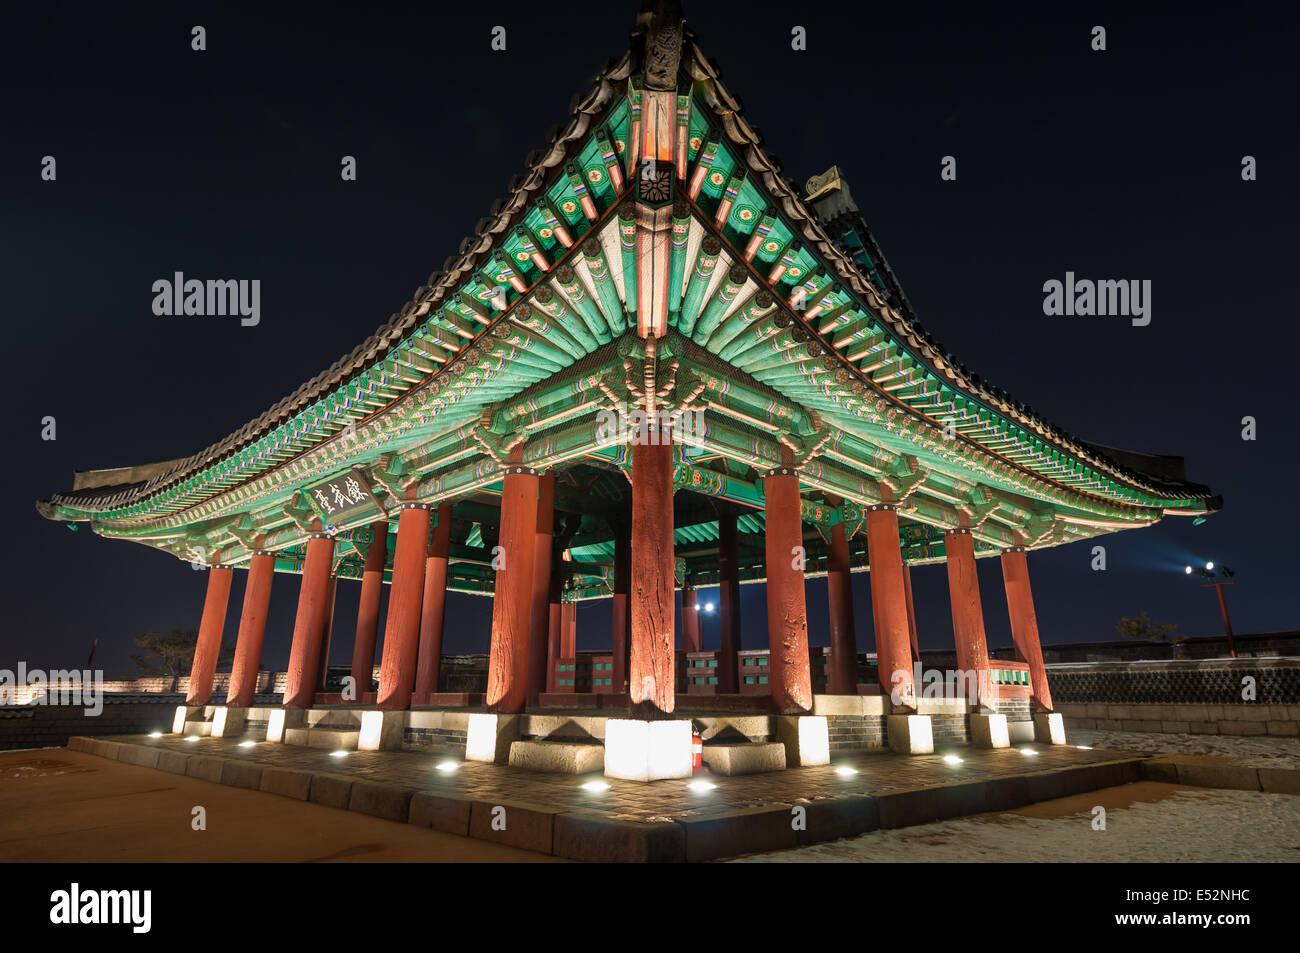 A pavilion at Hwaseong Fortress in Suwon, South Korea. - Stock Image